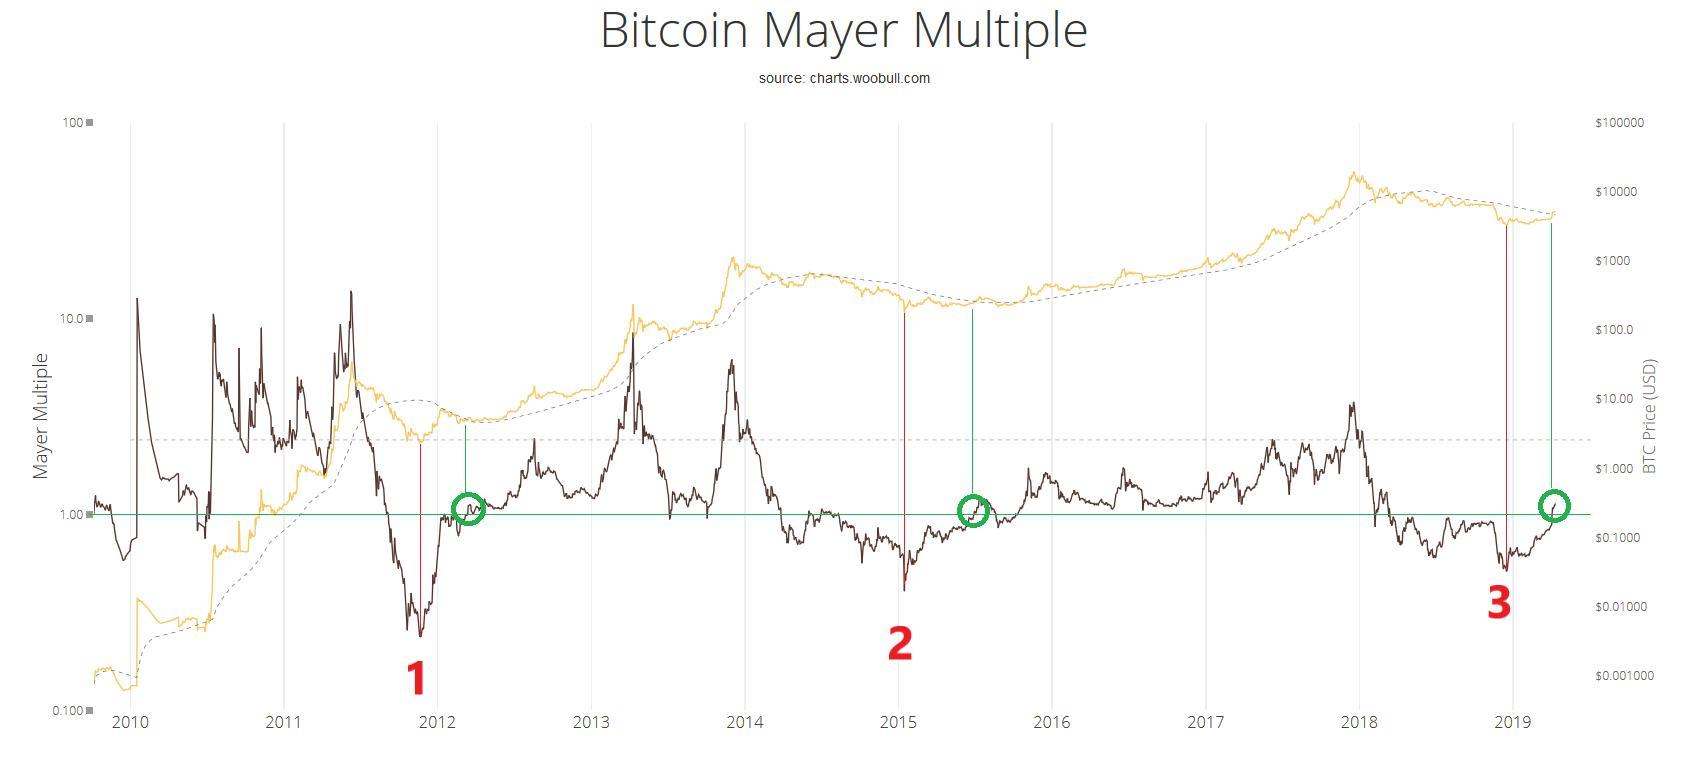 Bitcoin already bottomed out